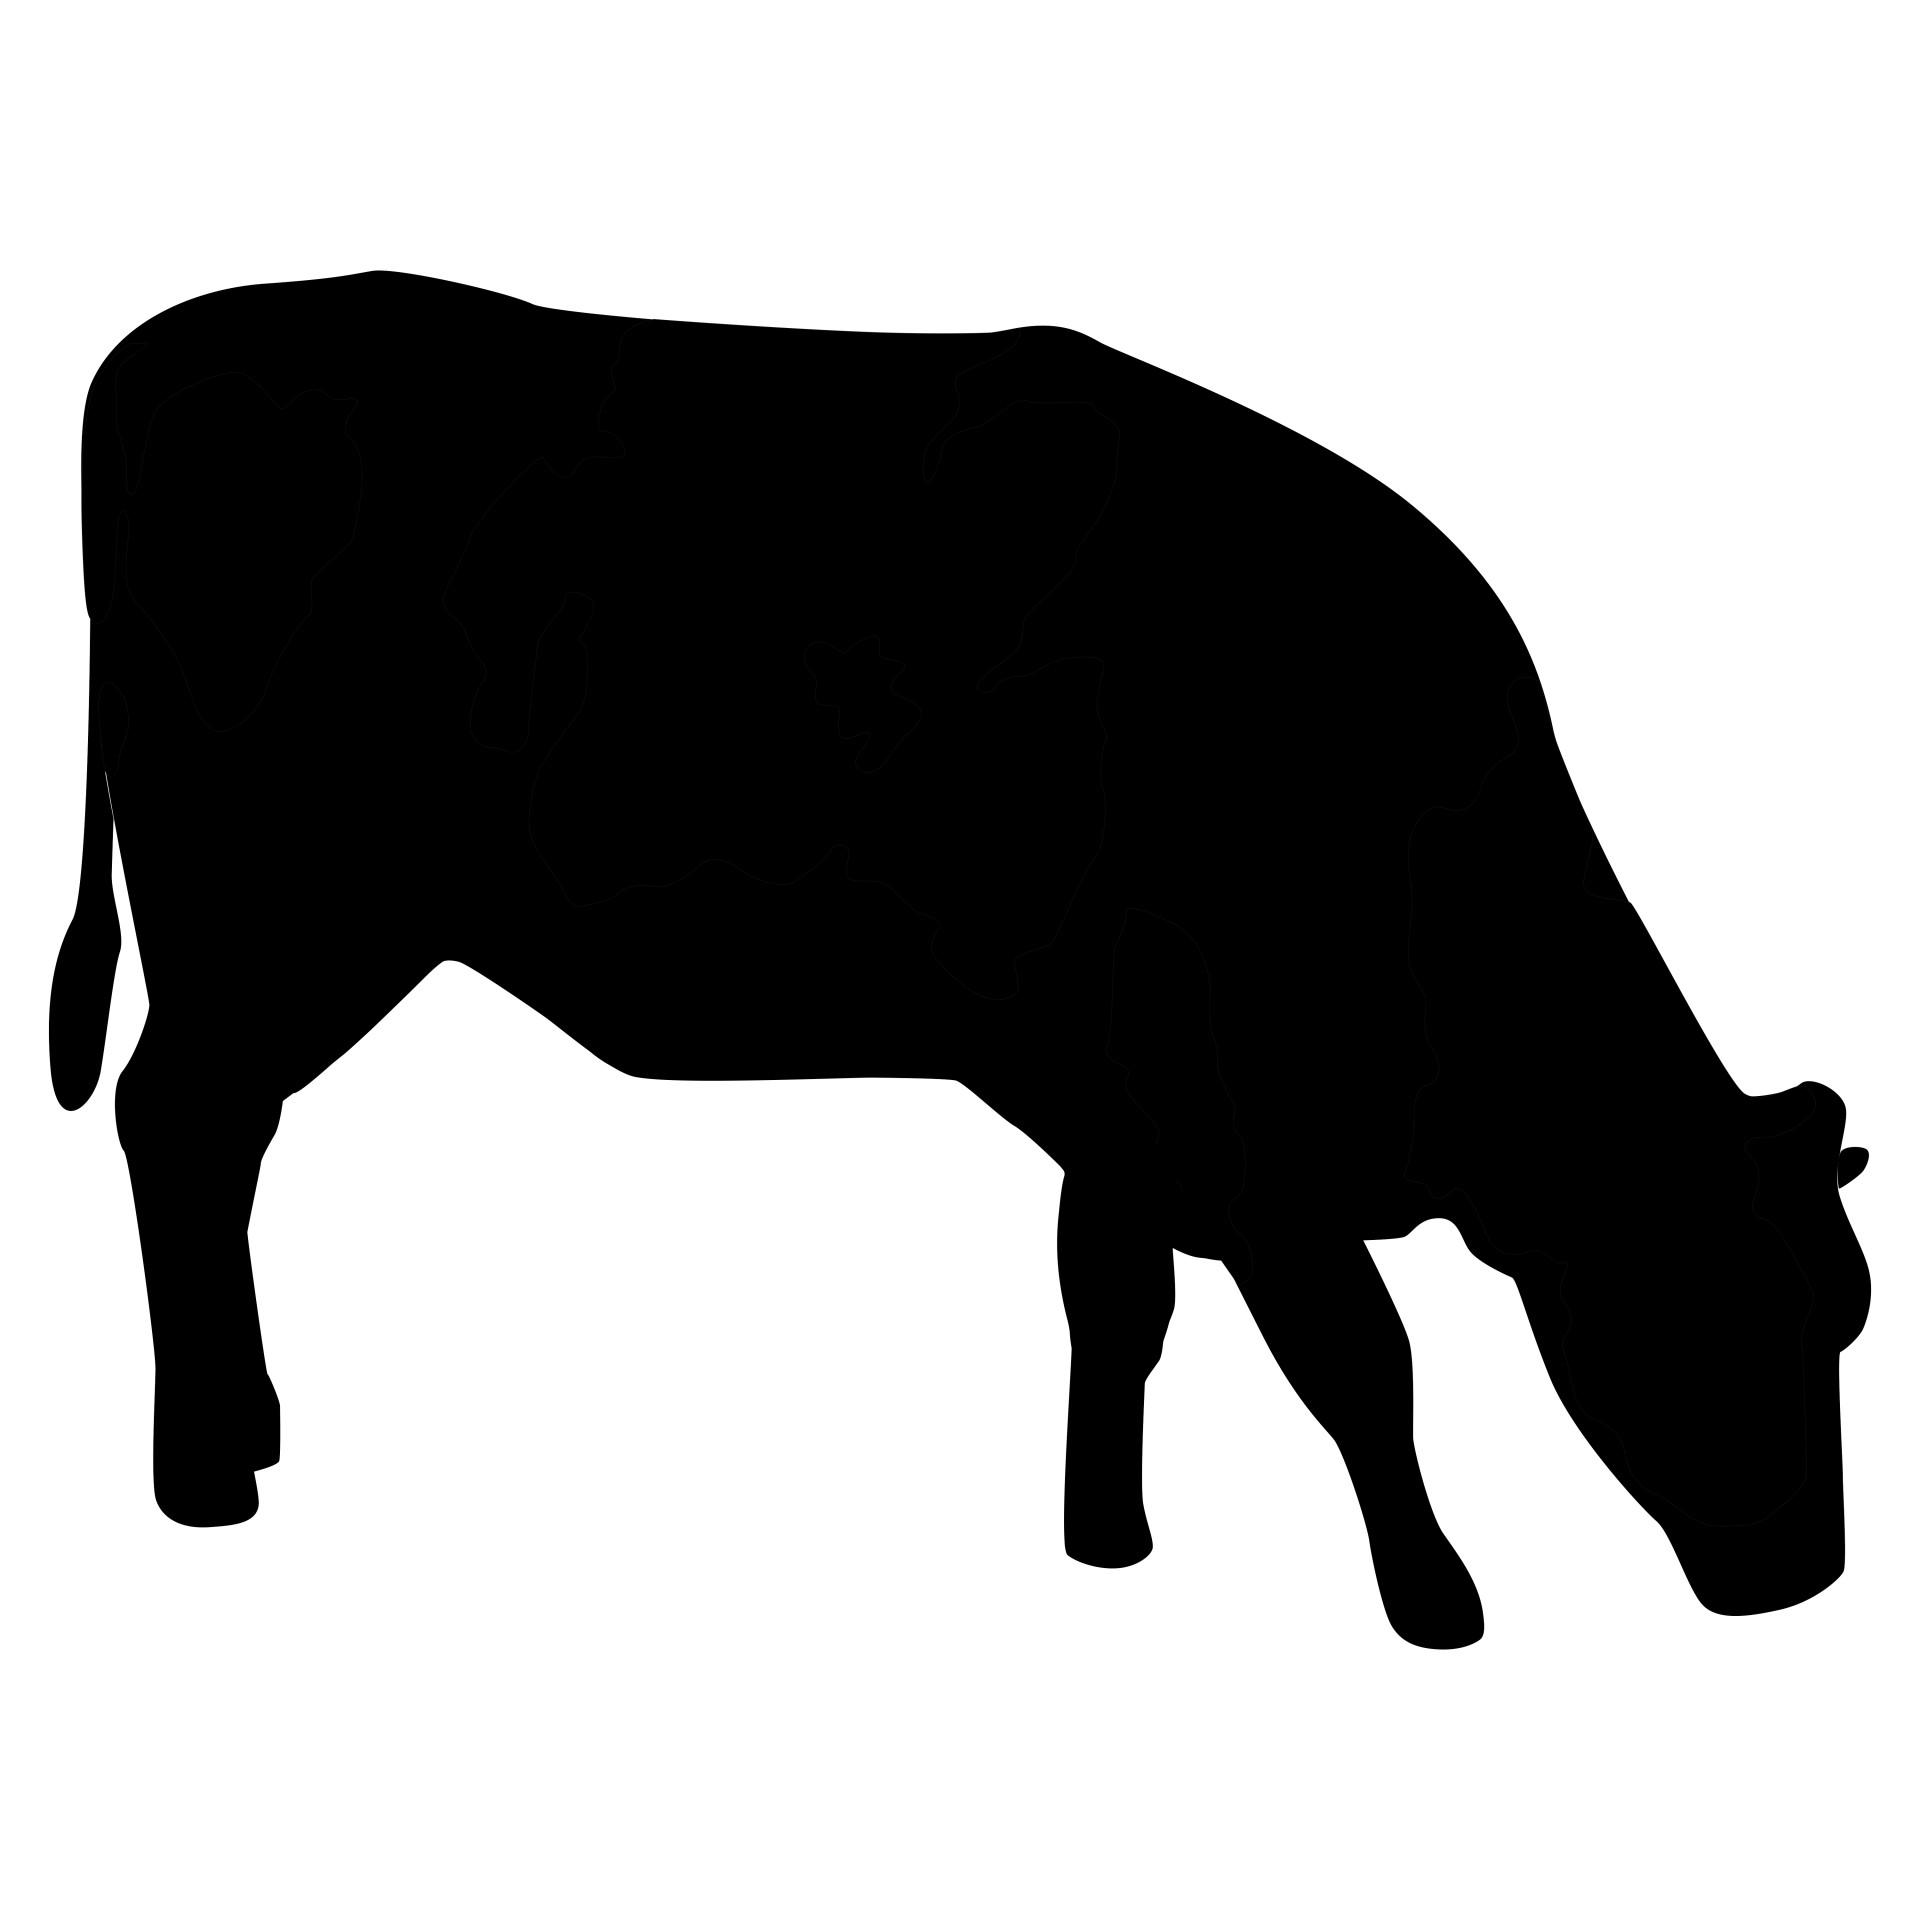 1920x1920 Cow Silhouette Free Stock Photo